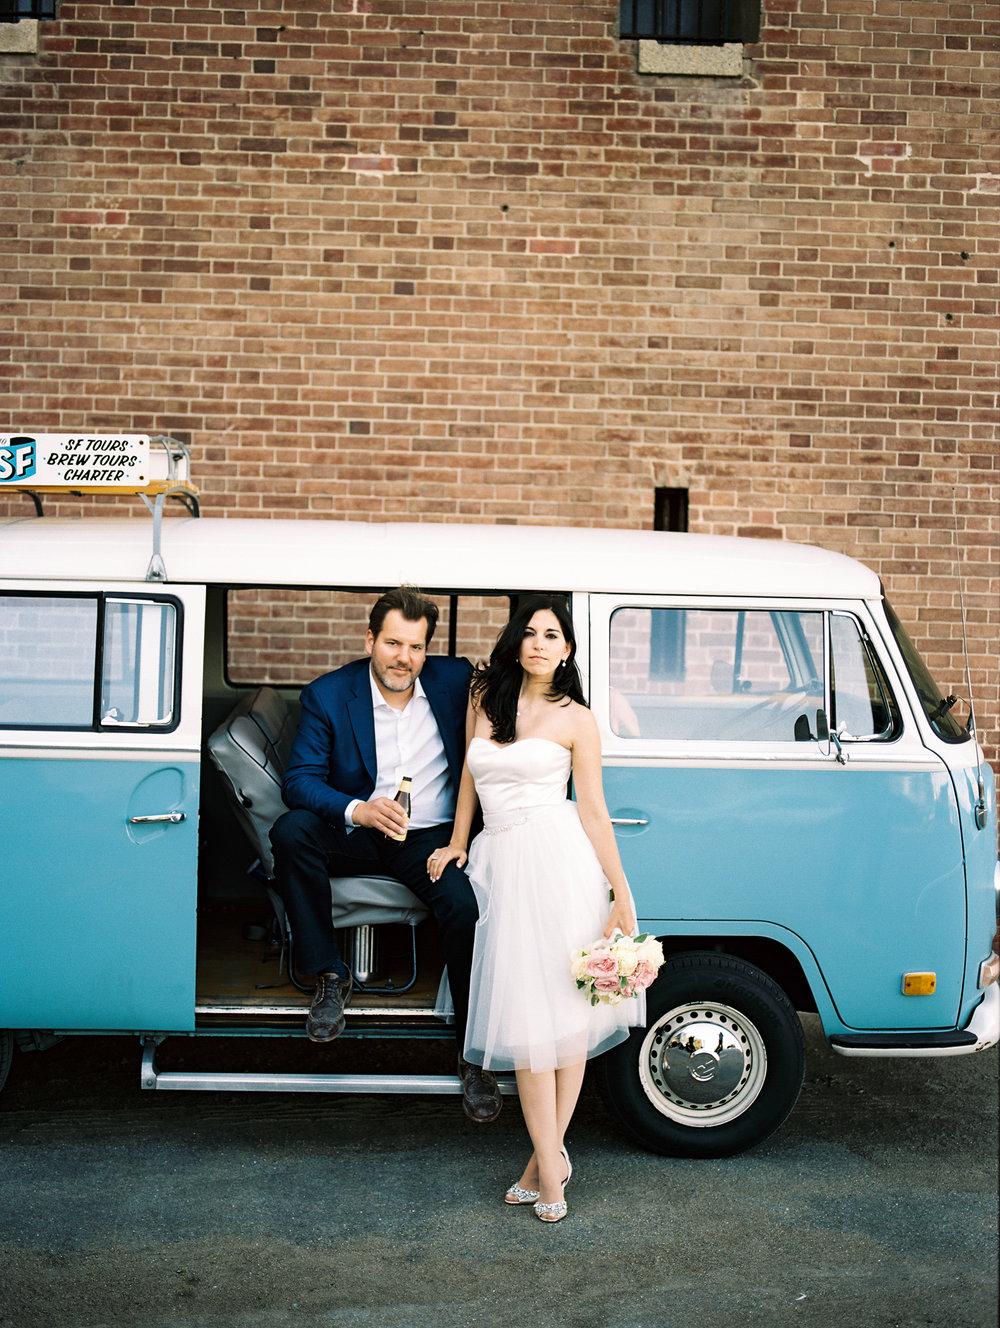 Aaron & Ana tour San Francisco -Coming Soon